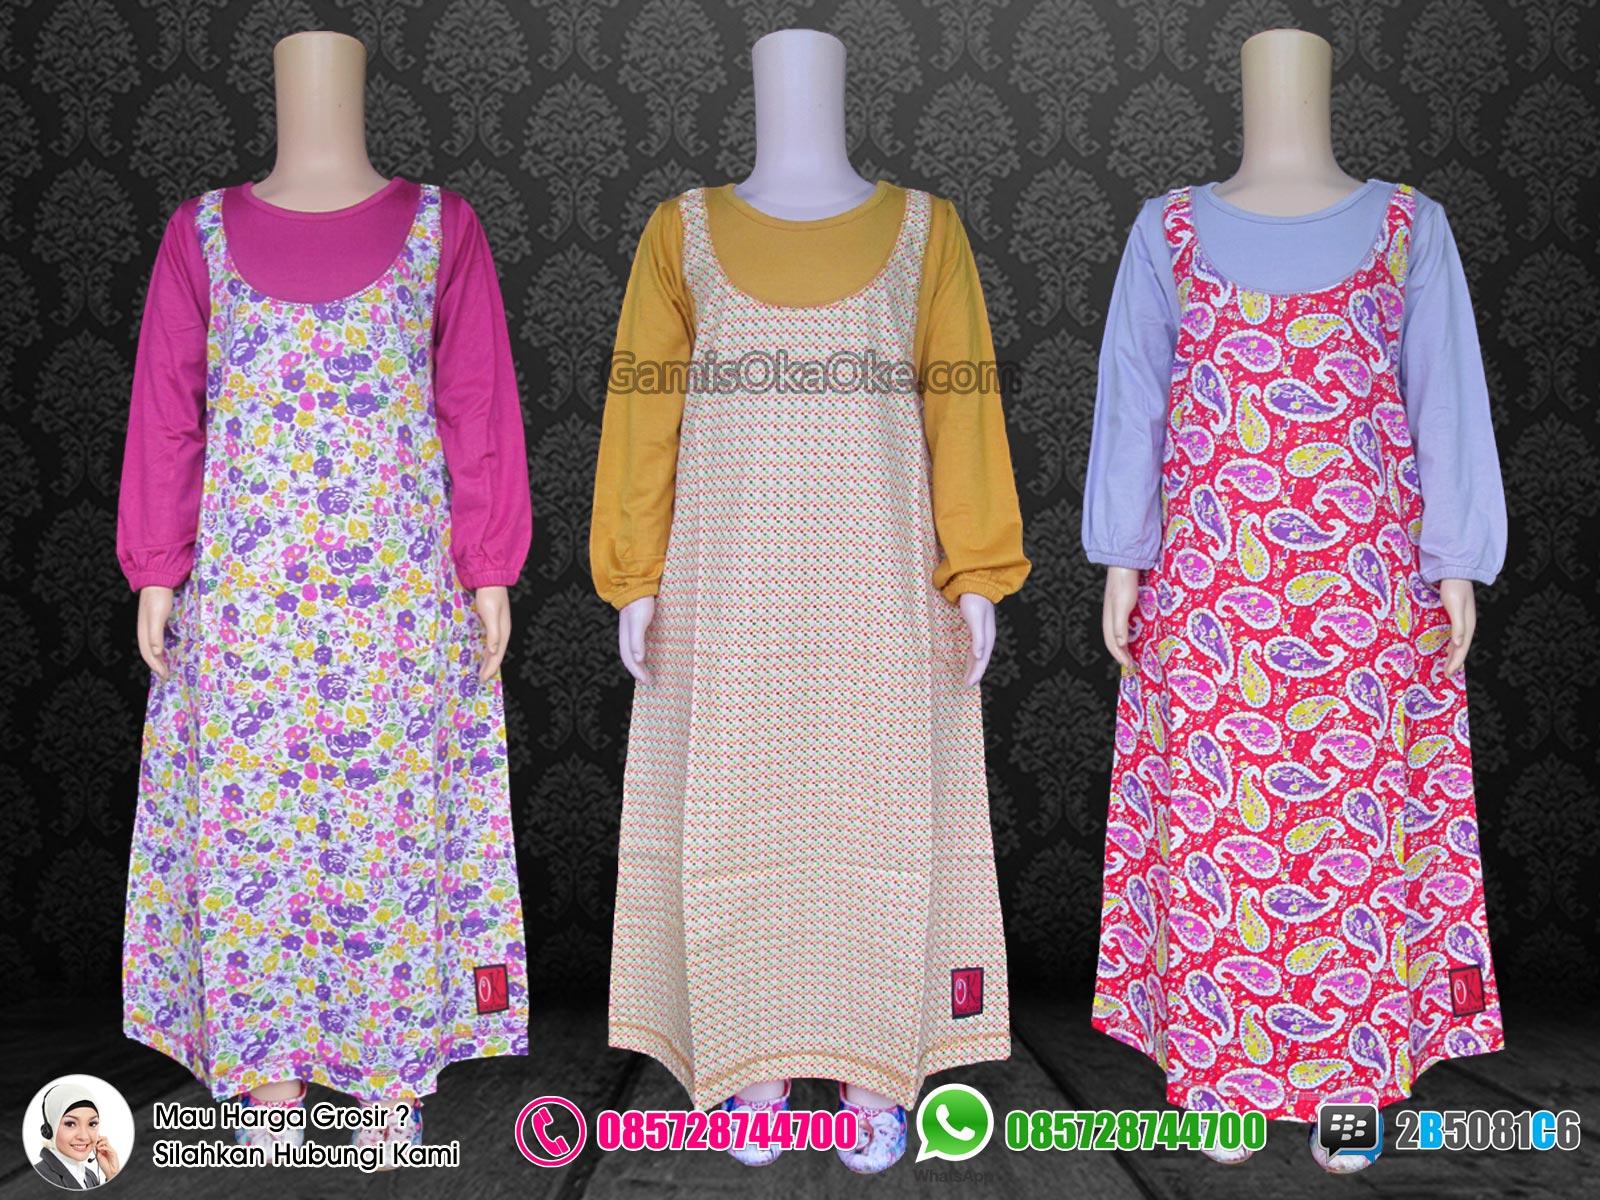 Tempat Grosir Baju Gamis Anak Perempuan Bahan Kaos Dan Katun Murah 75cd987991